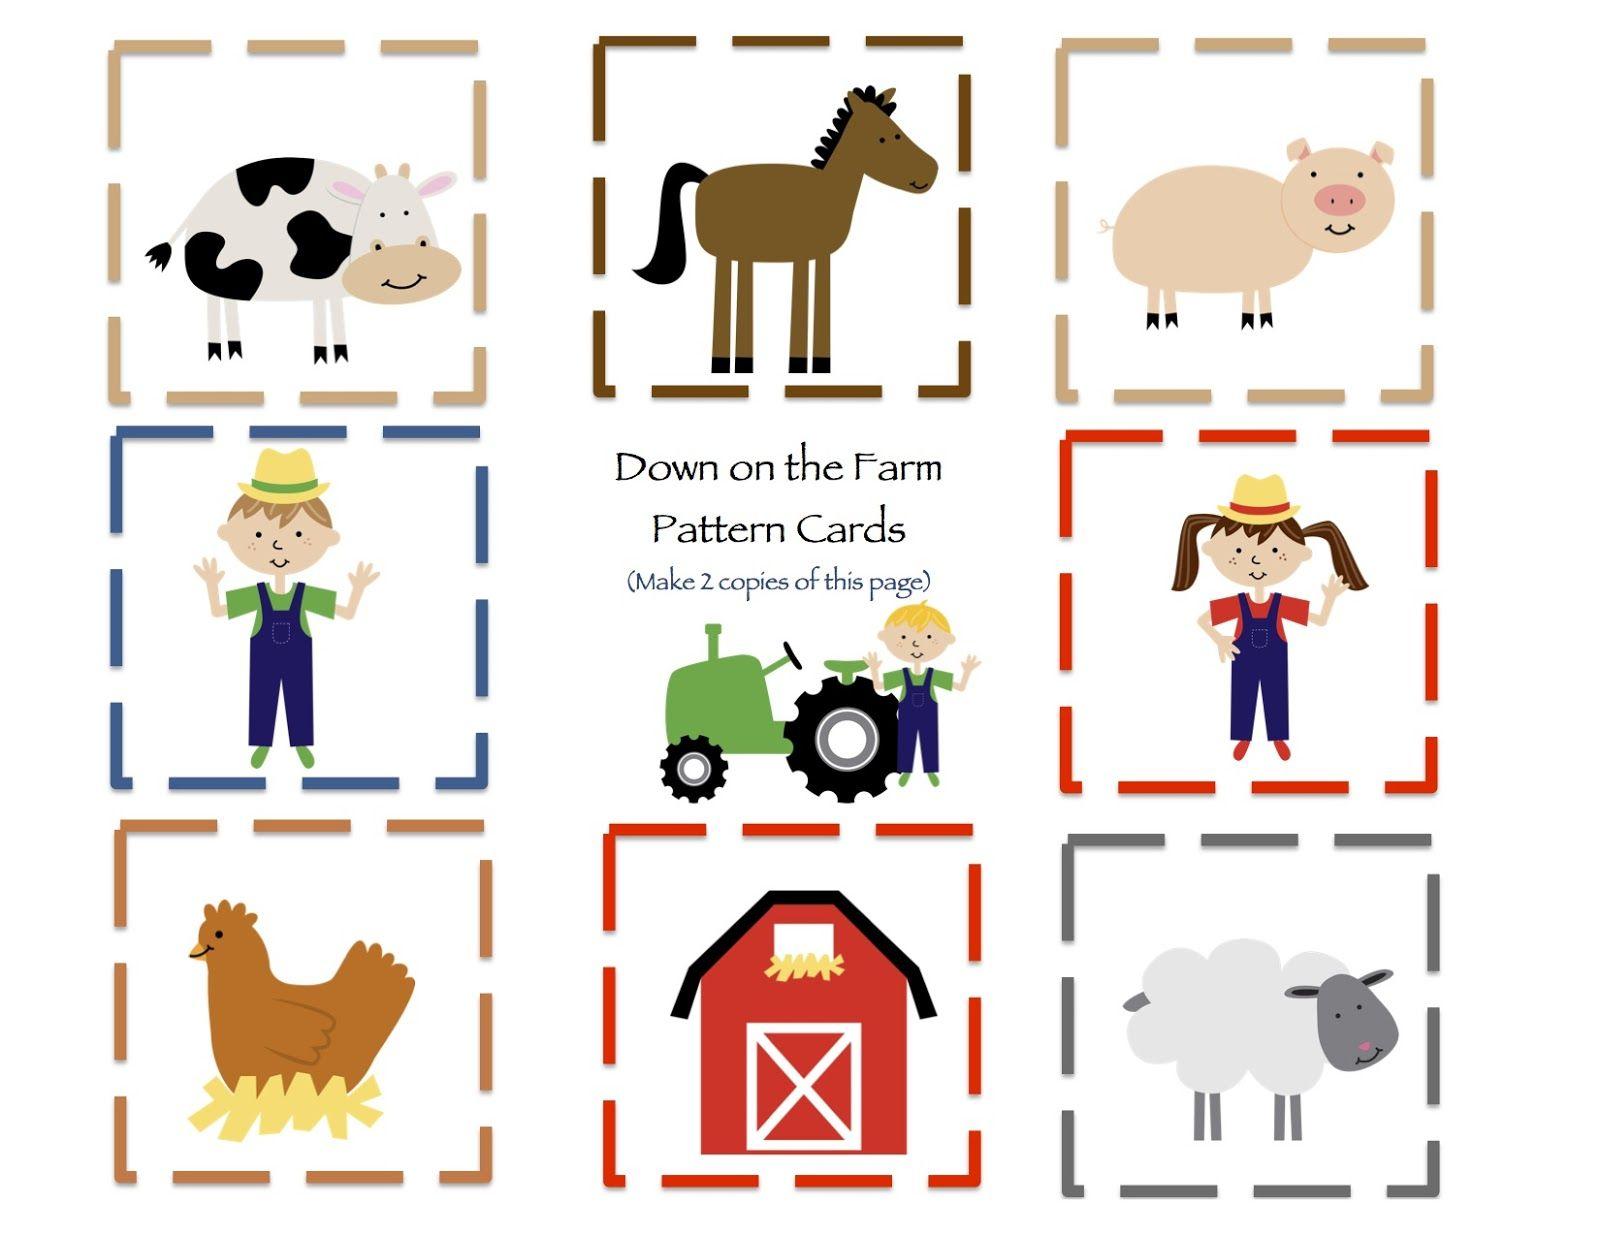 Preschool Printables (With images) | Farm preschool, Farm ...